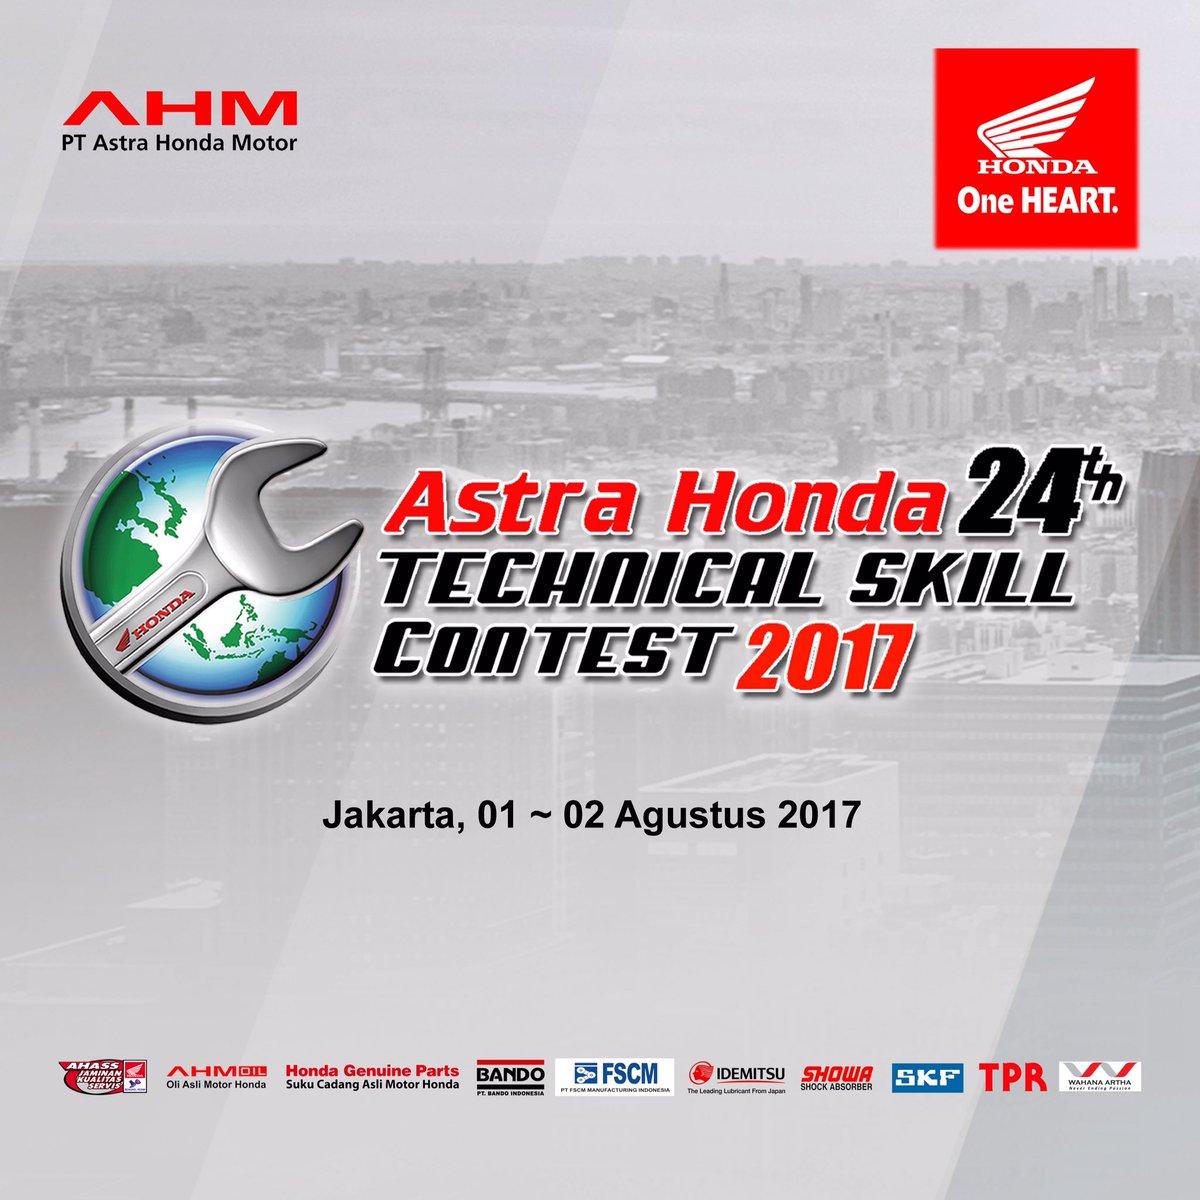 Welovehonda On Twitter Tema Astra Honda Technical Skill Contest Tahun Ini Yaitu Proudness To Be Part Of Family Astrahondatechcontest2017